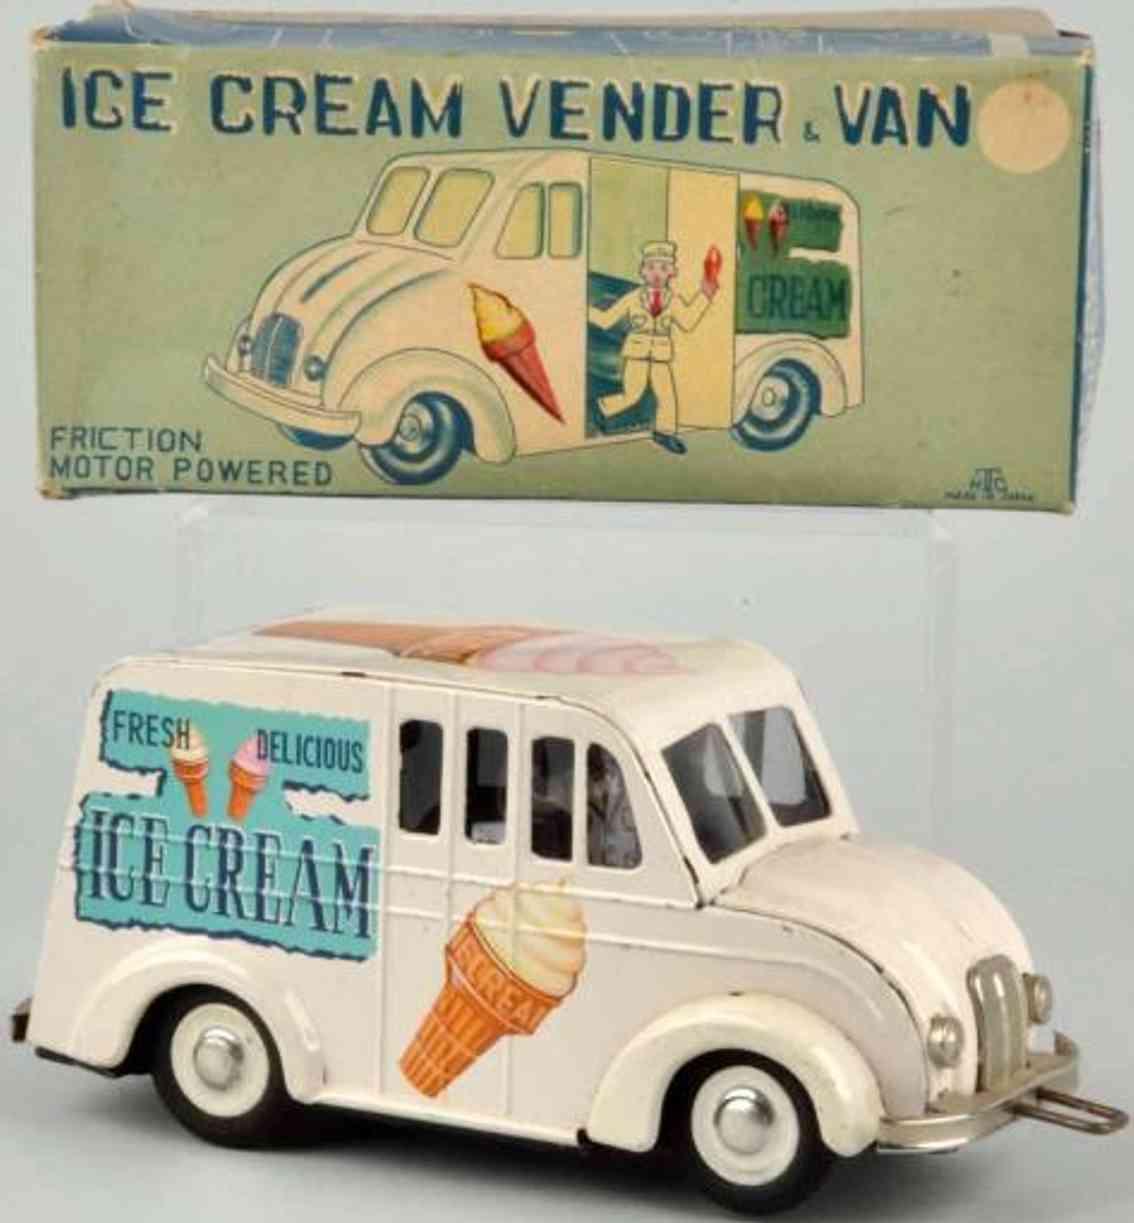 htc tin toy truck ice cream vender van with ice cram figure